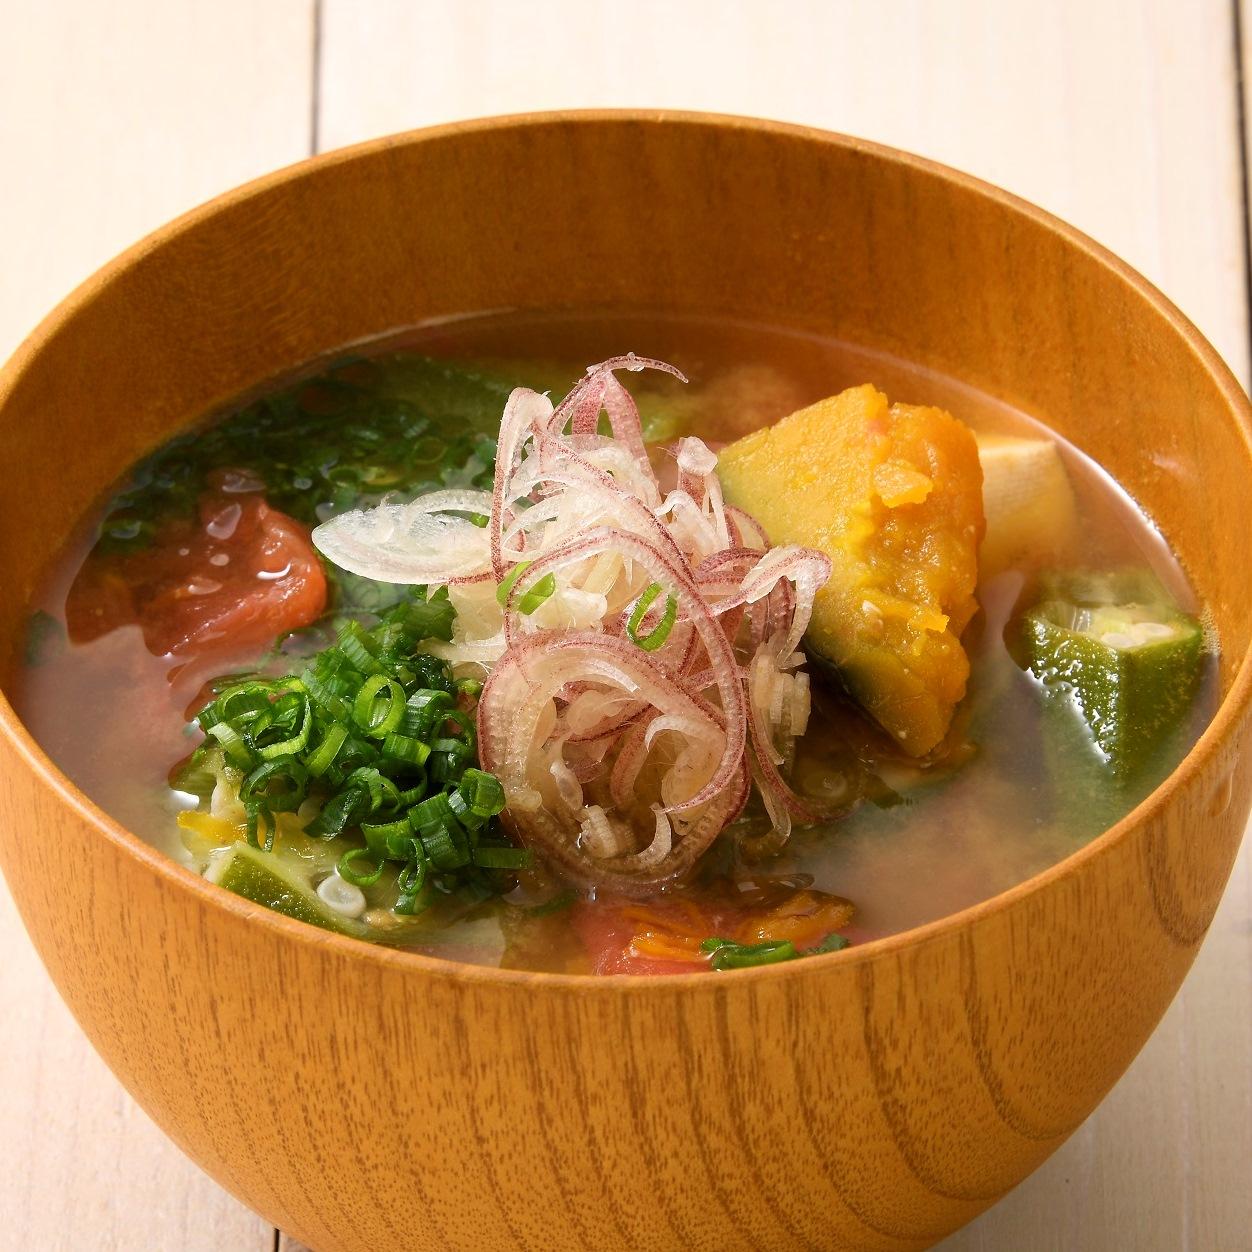 夏野菜の味噌󠄀汁